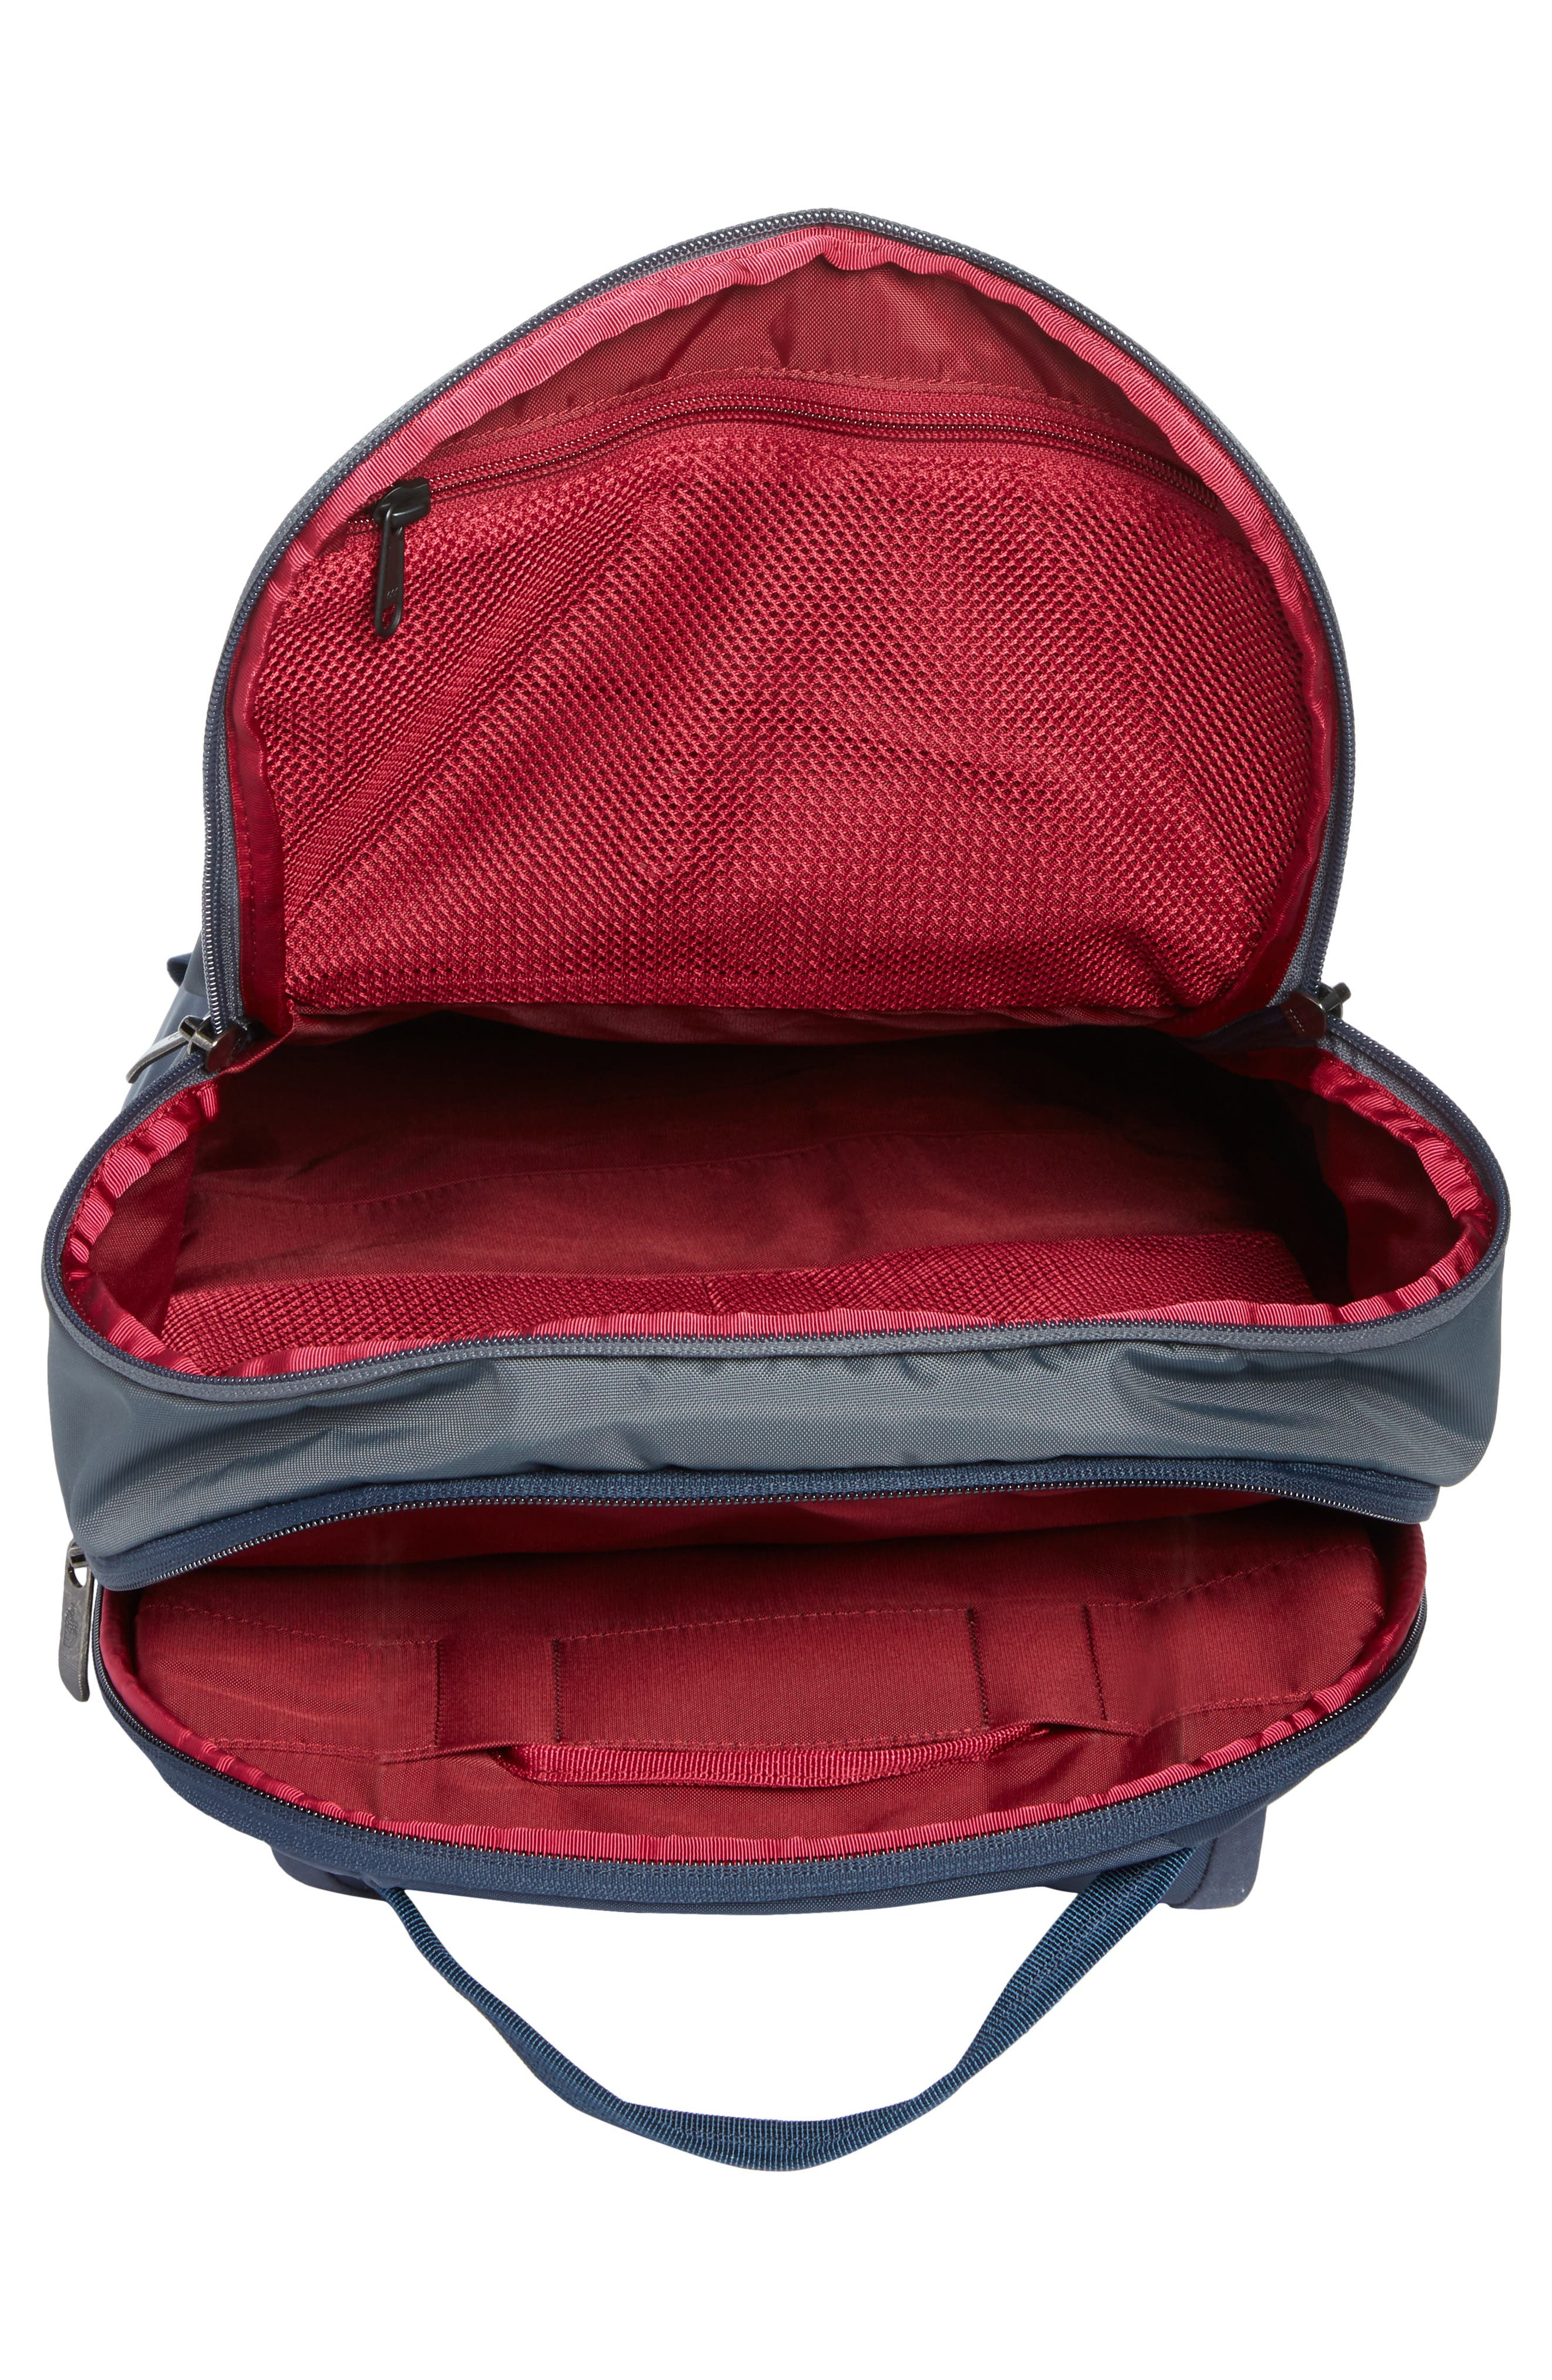 Kabyte Backpack,                             Alternate thumbnail 4, color,                             VANADIS GREY/ URBAN NAVY